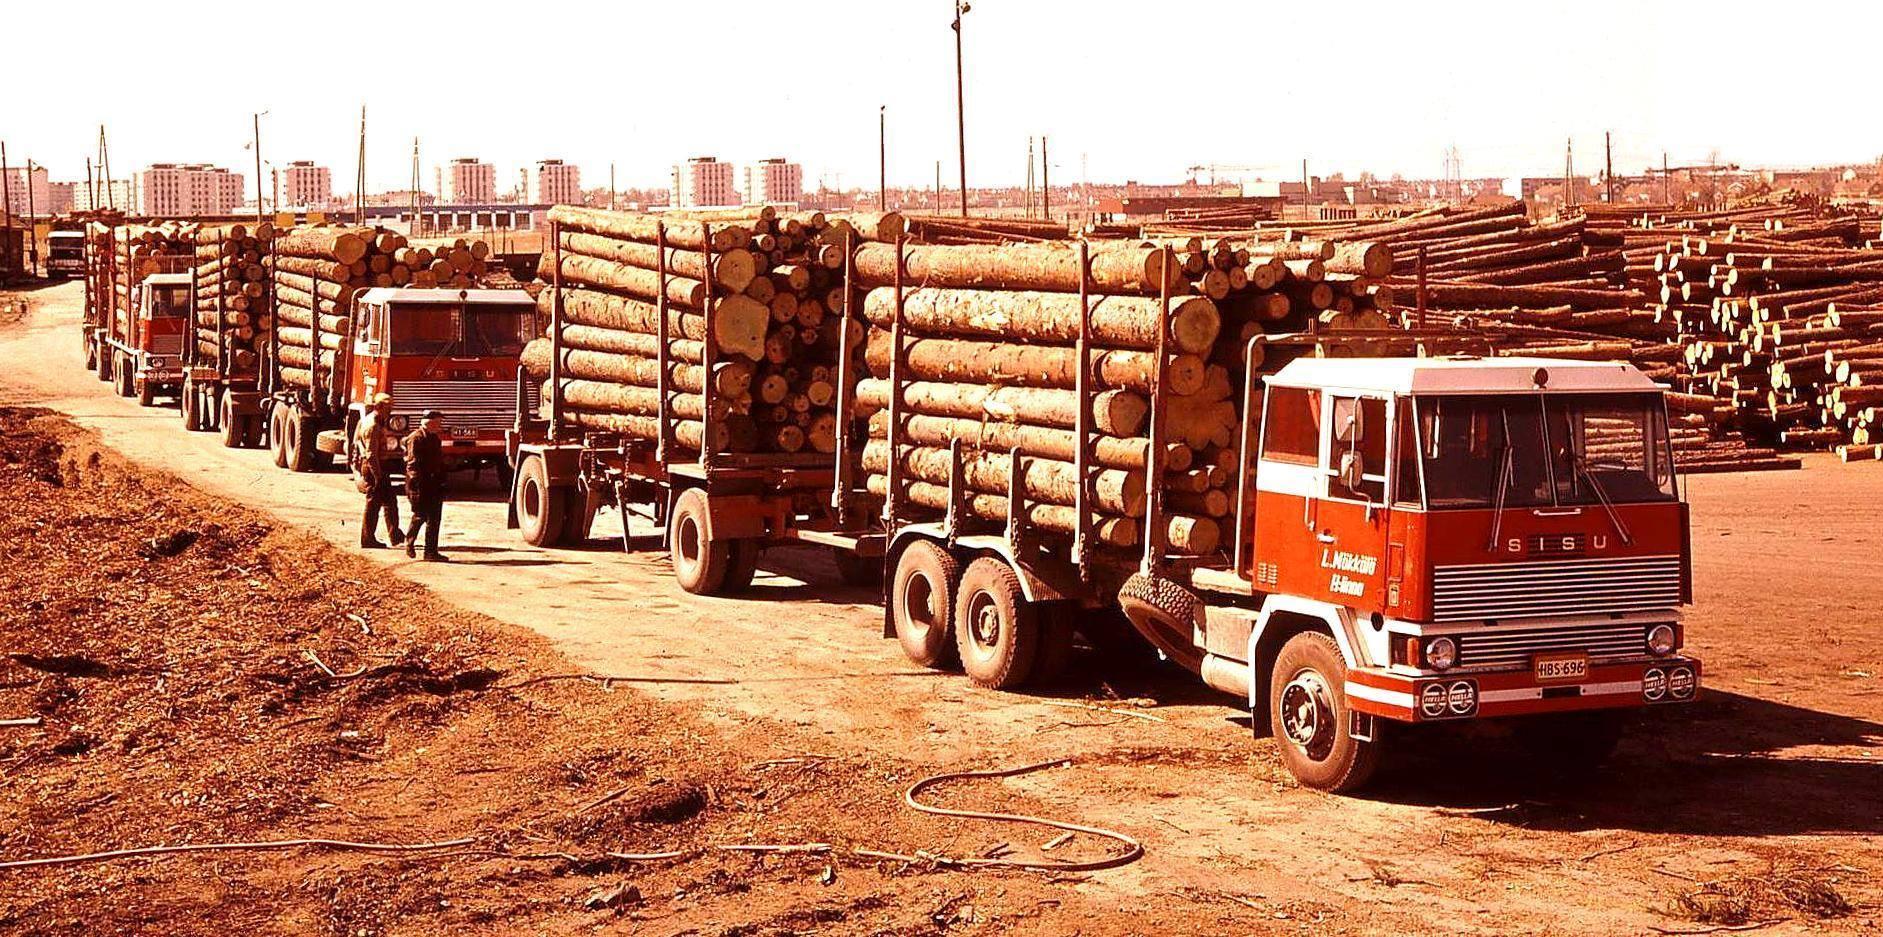 Sisu-M-162-CST-6X2-1973_80-309-PS-12-2-Ltr-6-Cyl-Turbo-Rollsa-Royce-MK-II